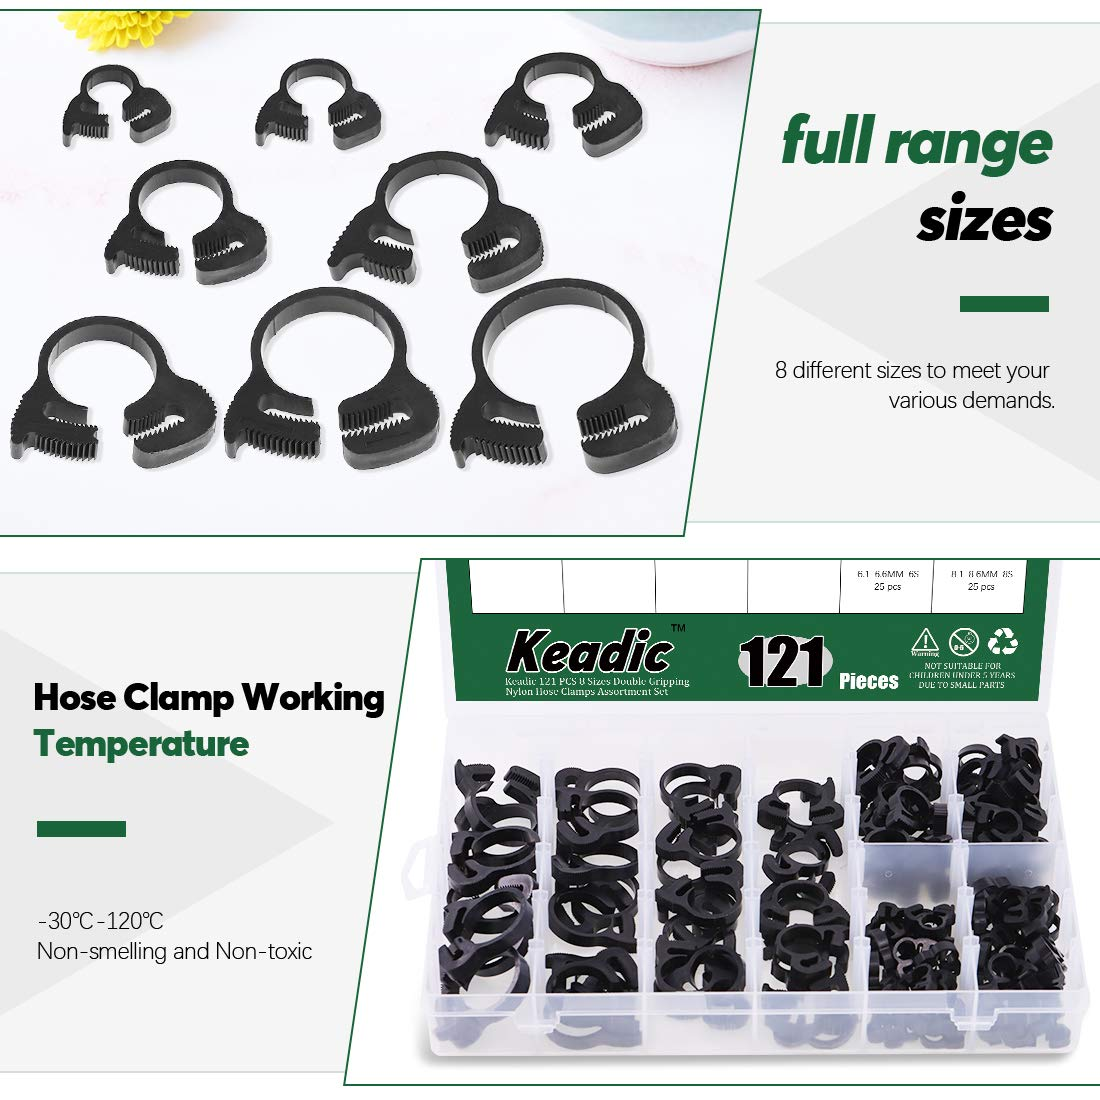 60-Pcs Heavy Duty Speedy Double Snap Grip Nylon Plastic Hose Clamps 8 Sizes Set Assortment